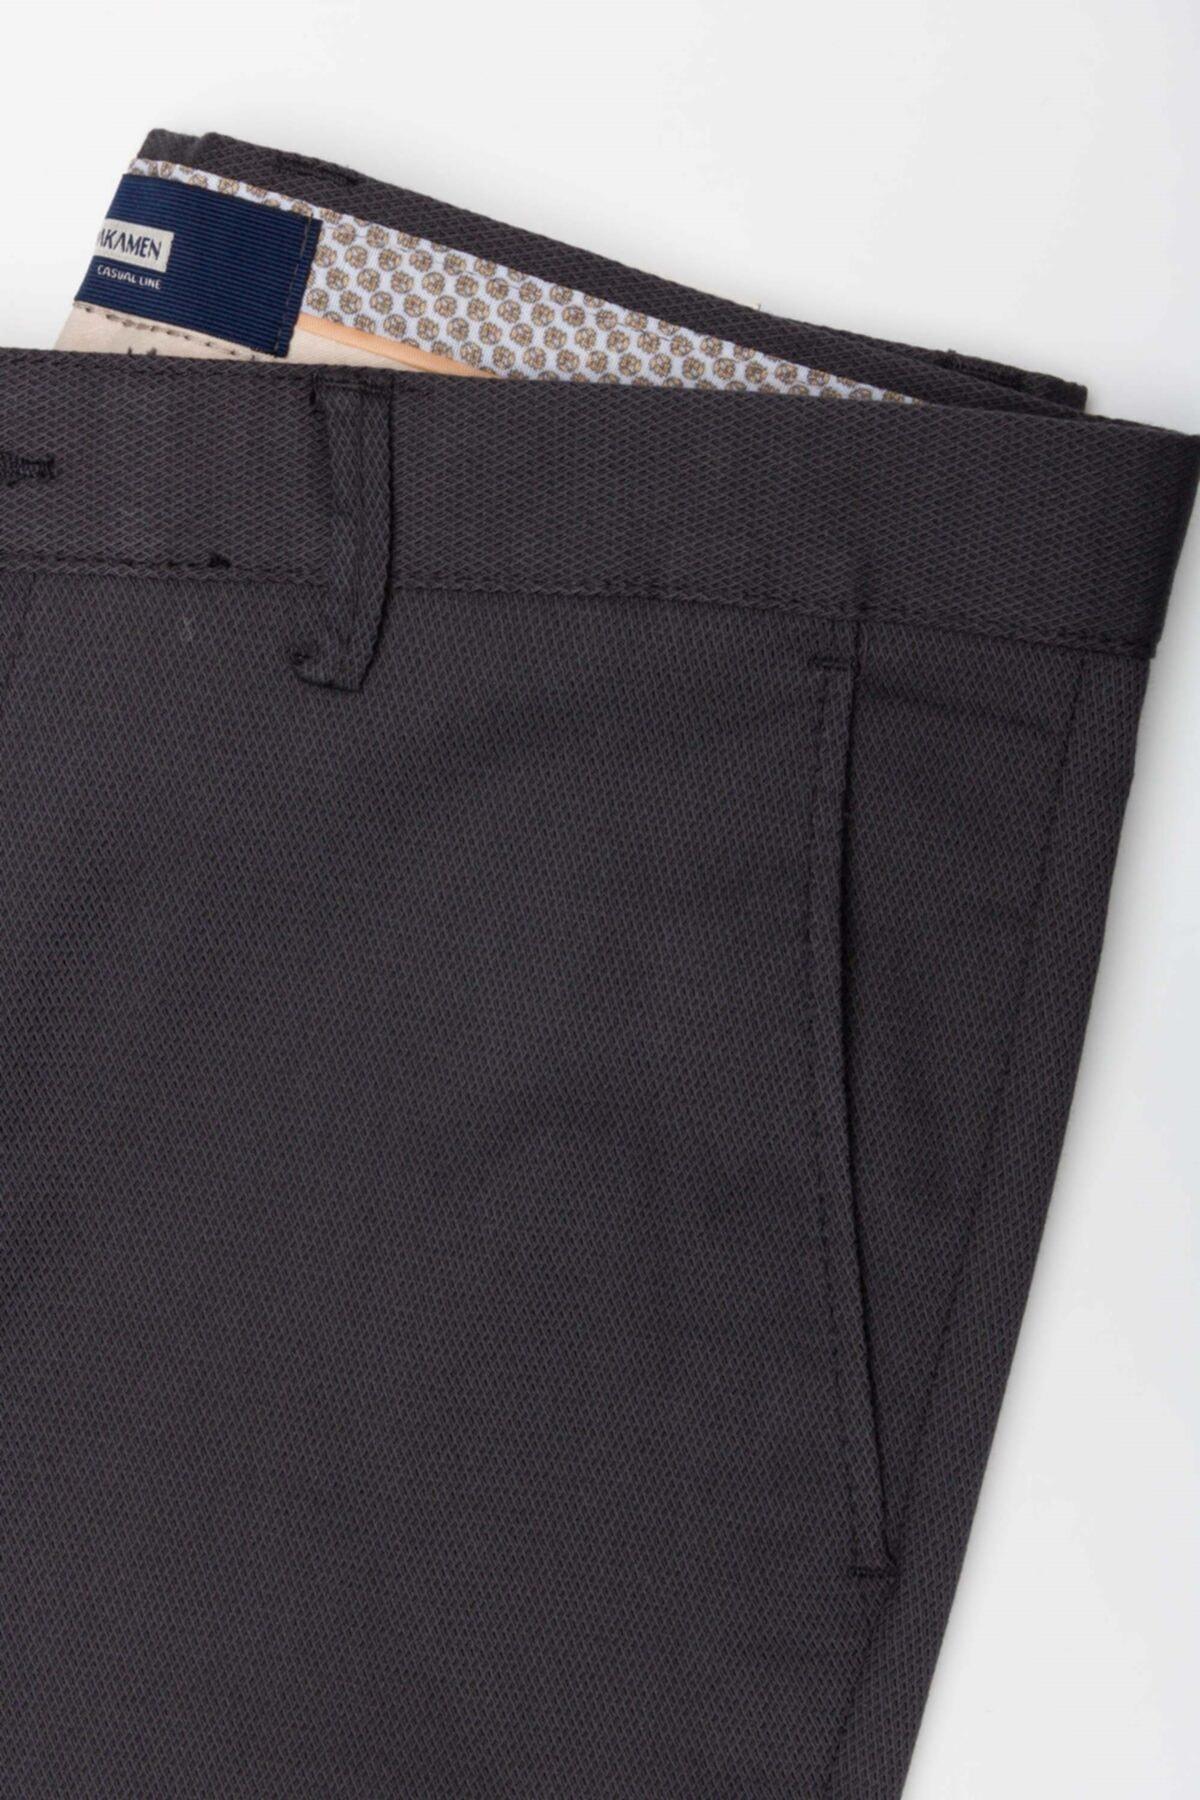 Jakamen Jk31es12m002 Ekstra Slim Erkek Pantolon-19 2